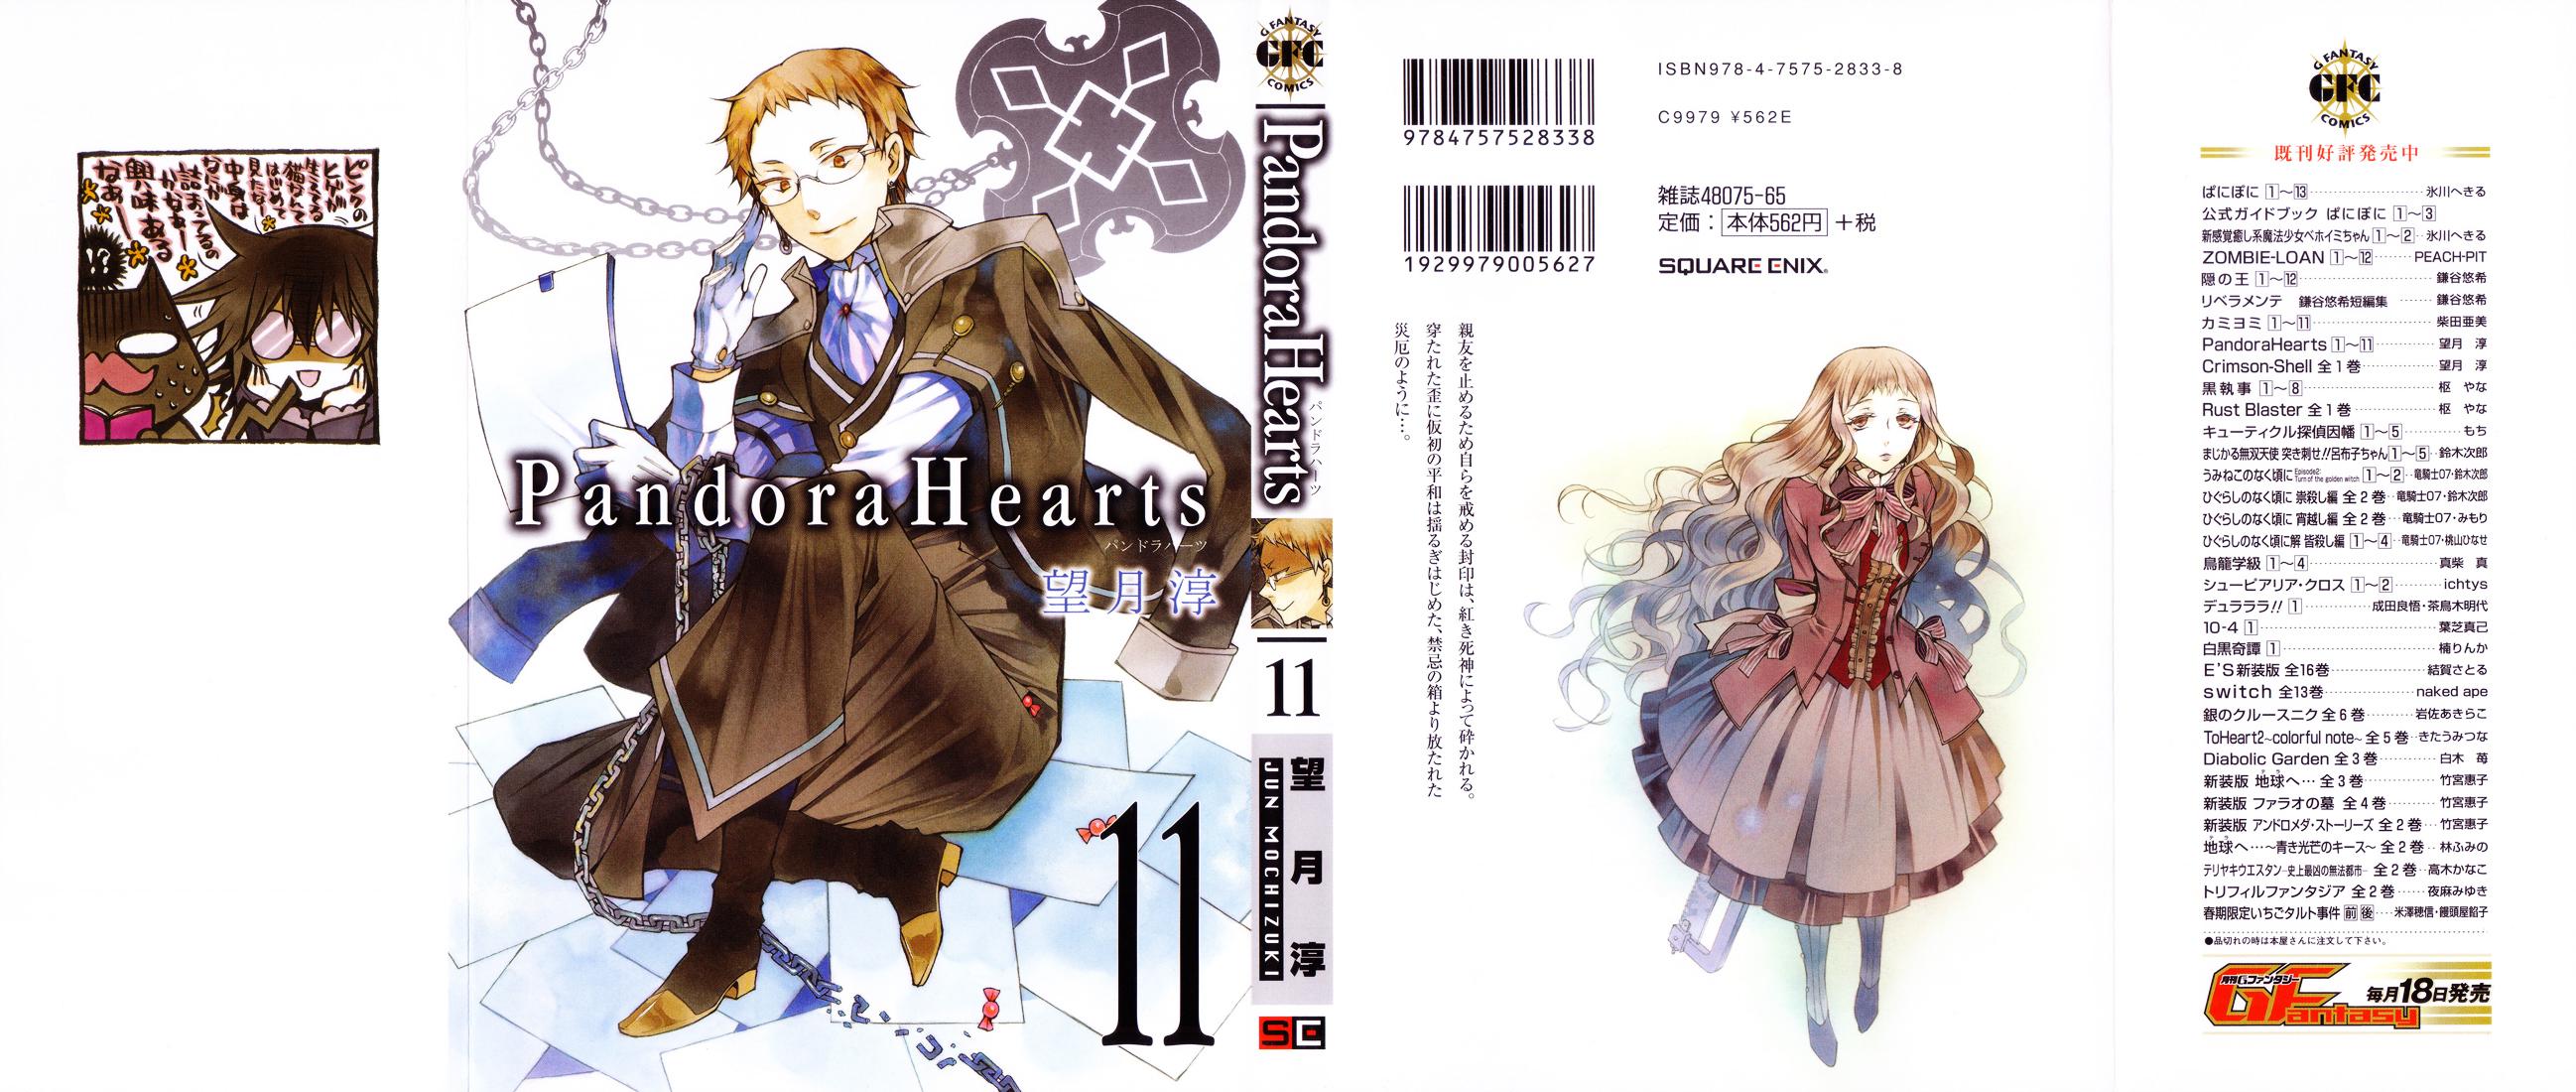 Pandora Hearts chương 042 - retrace: xlii stray-v002 trang 1